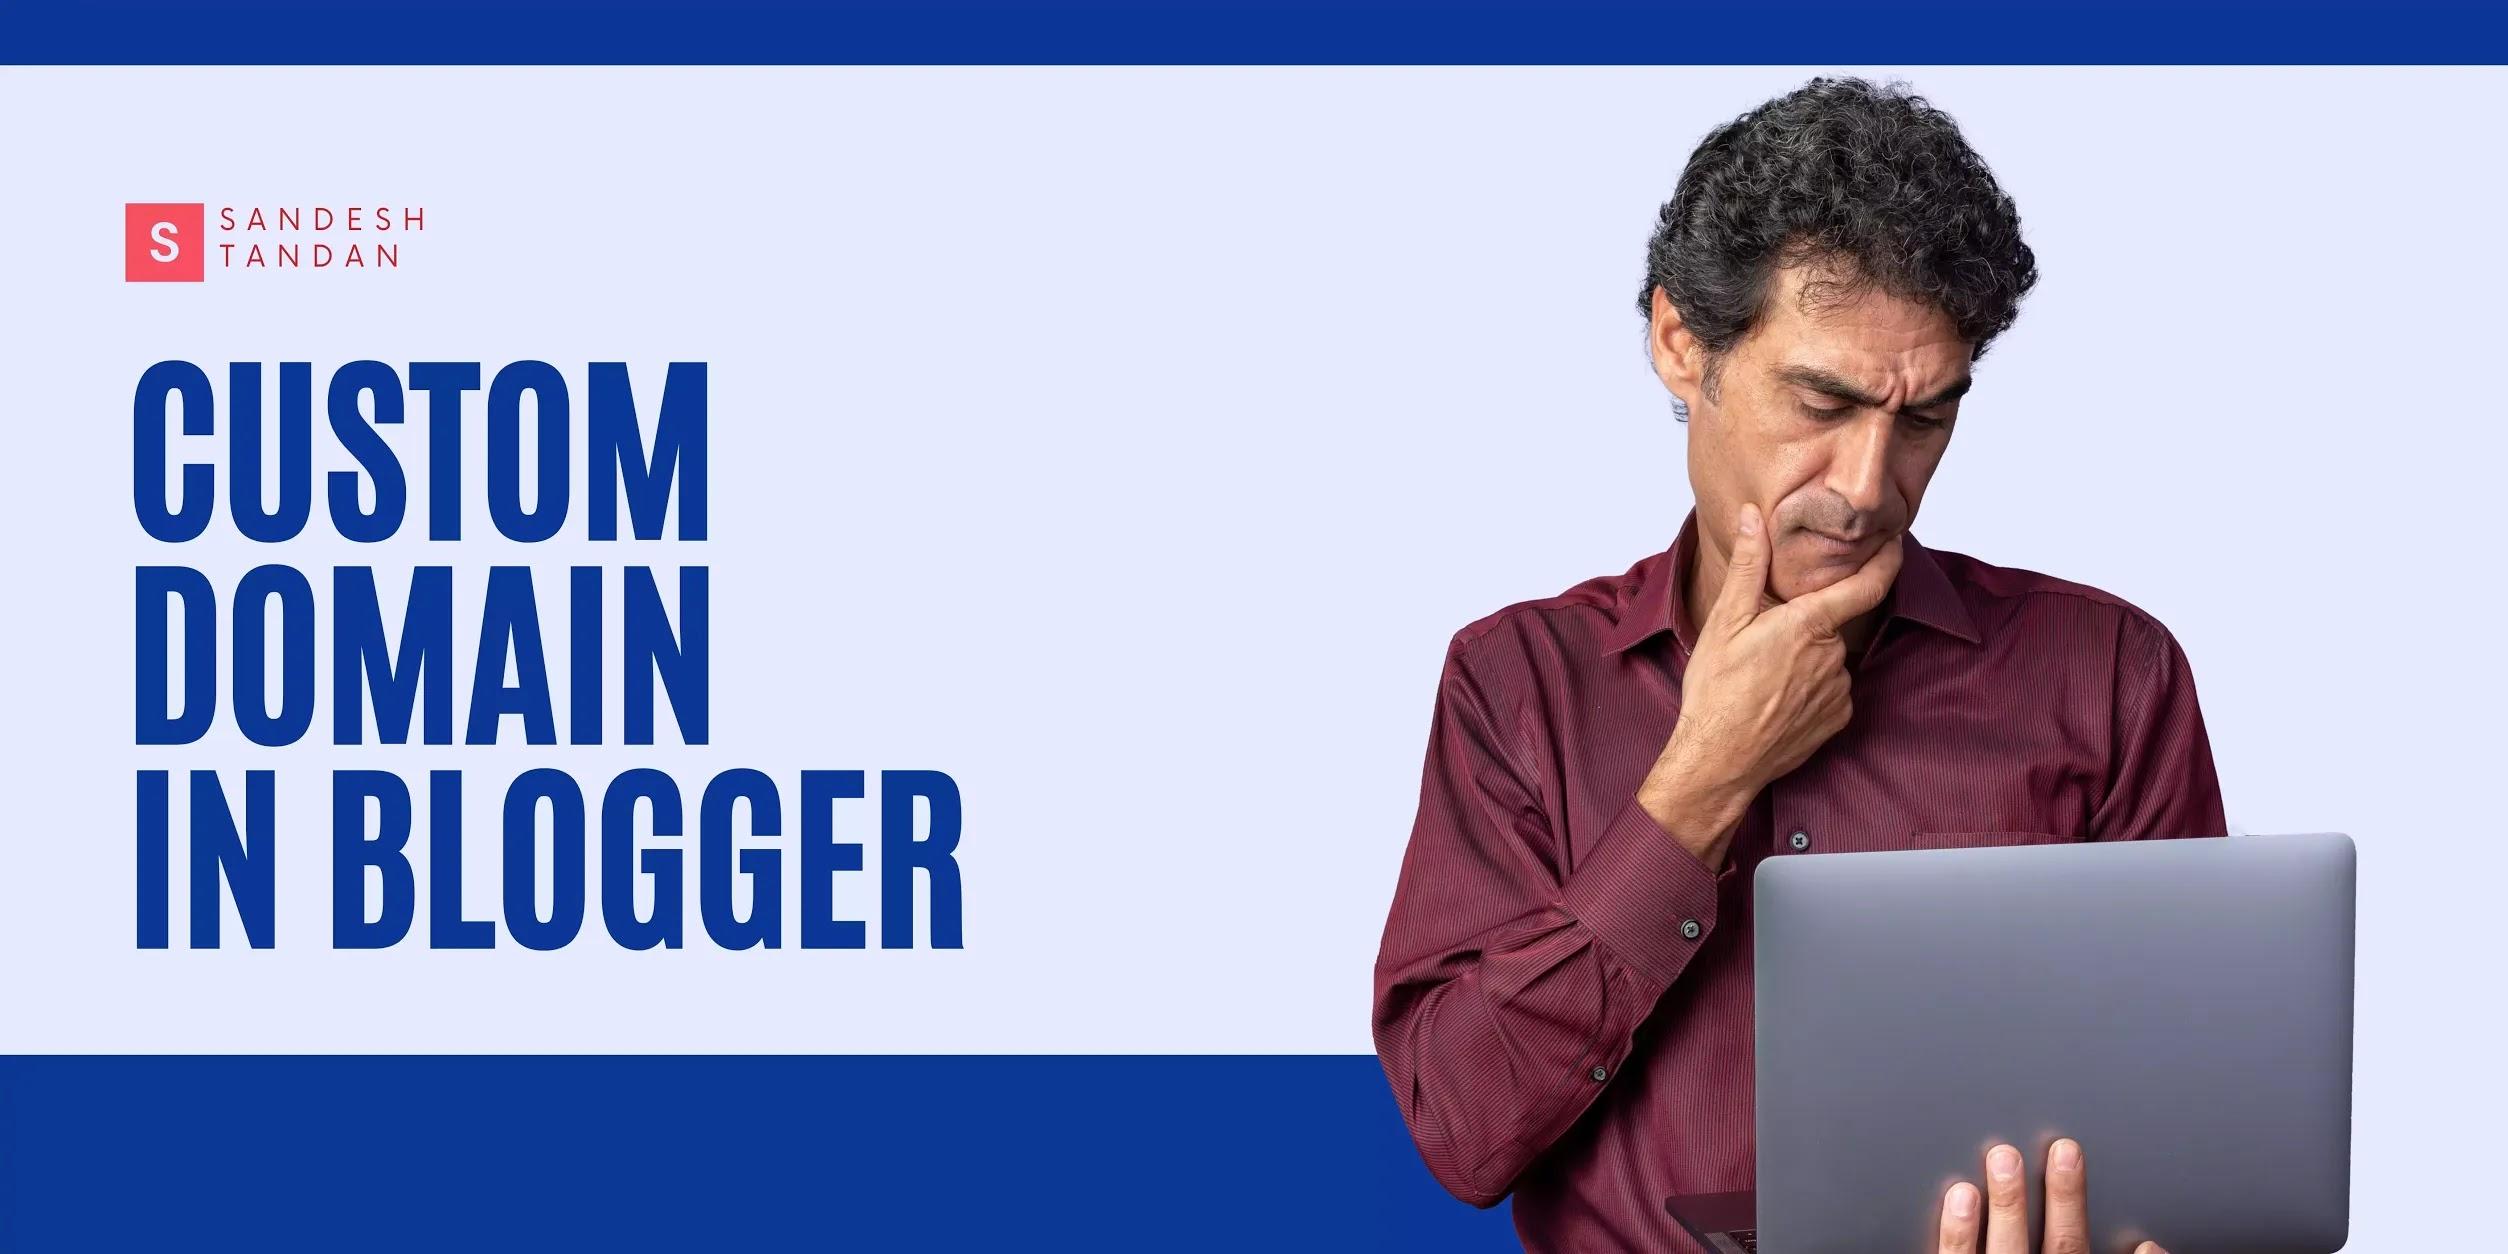 Custom Domain in a Blogger